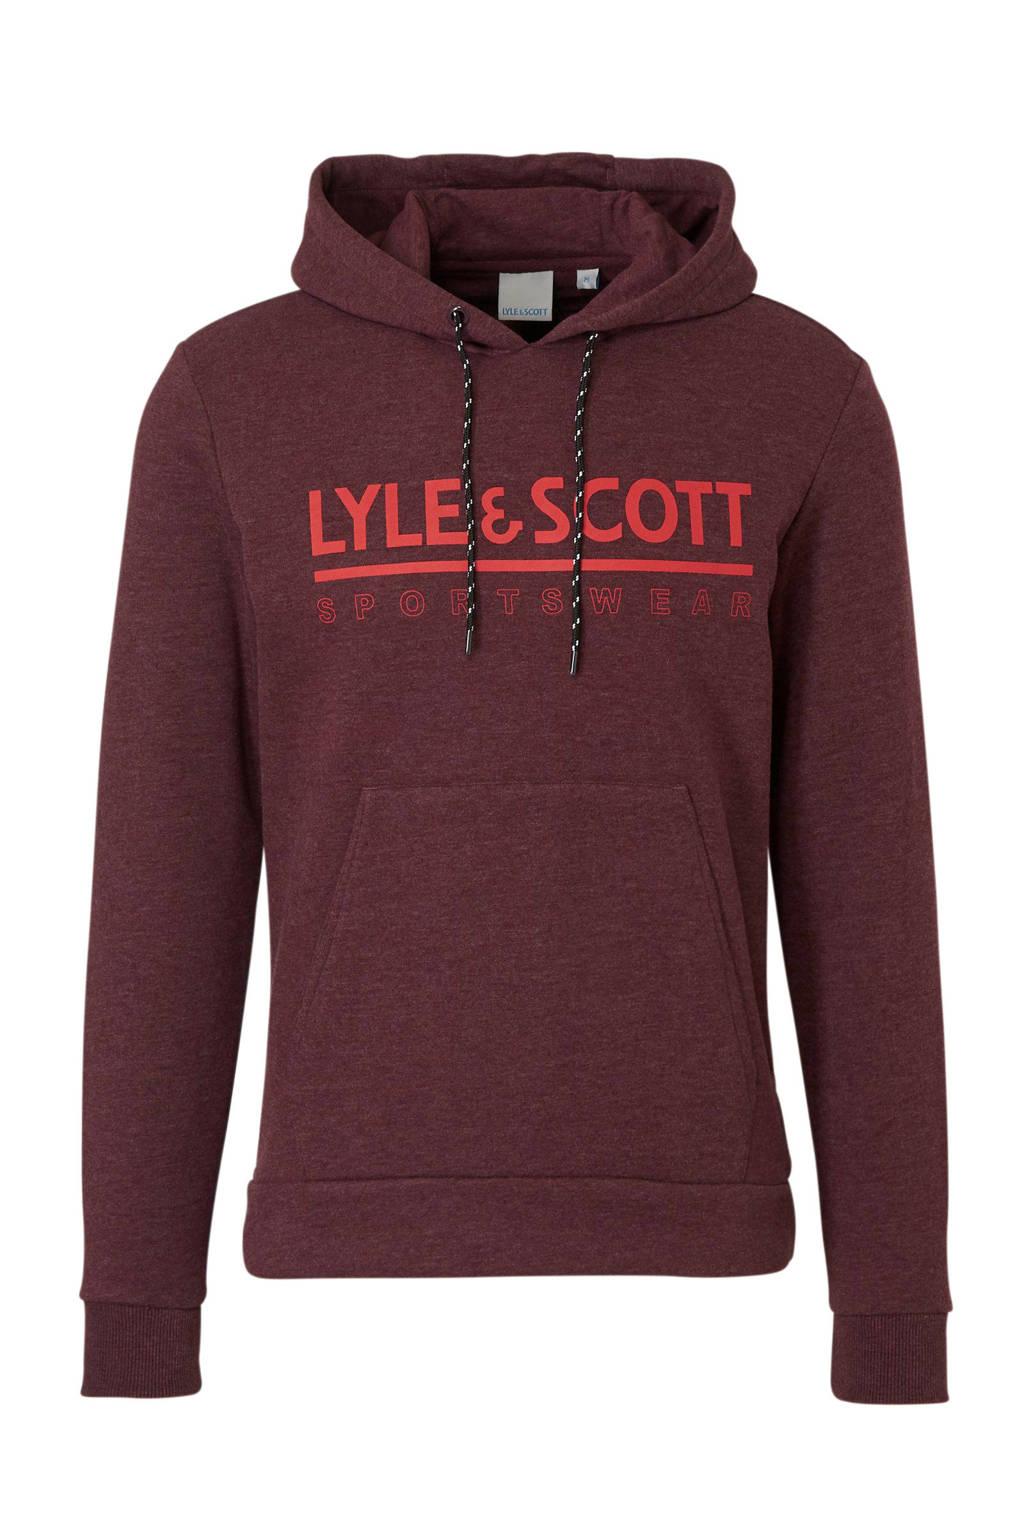 Lyle & Scott   hoodie bordeauxrood, Antraciet